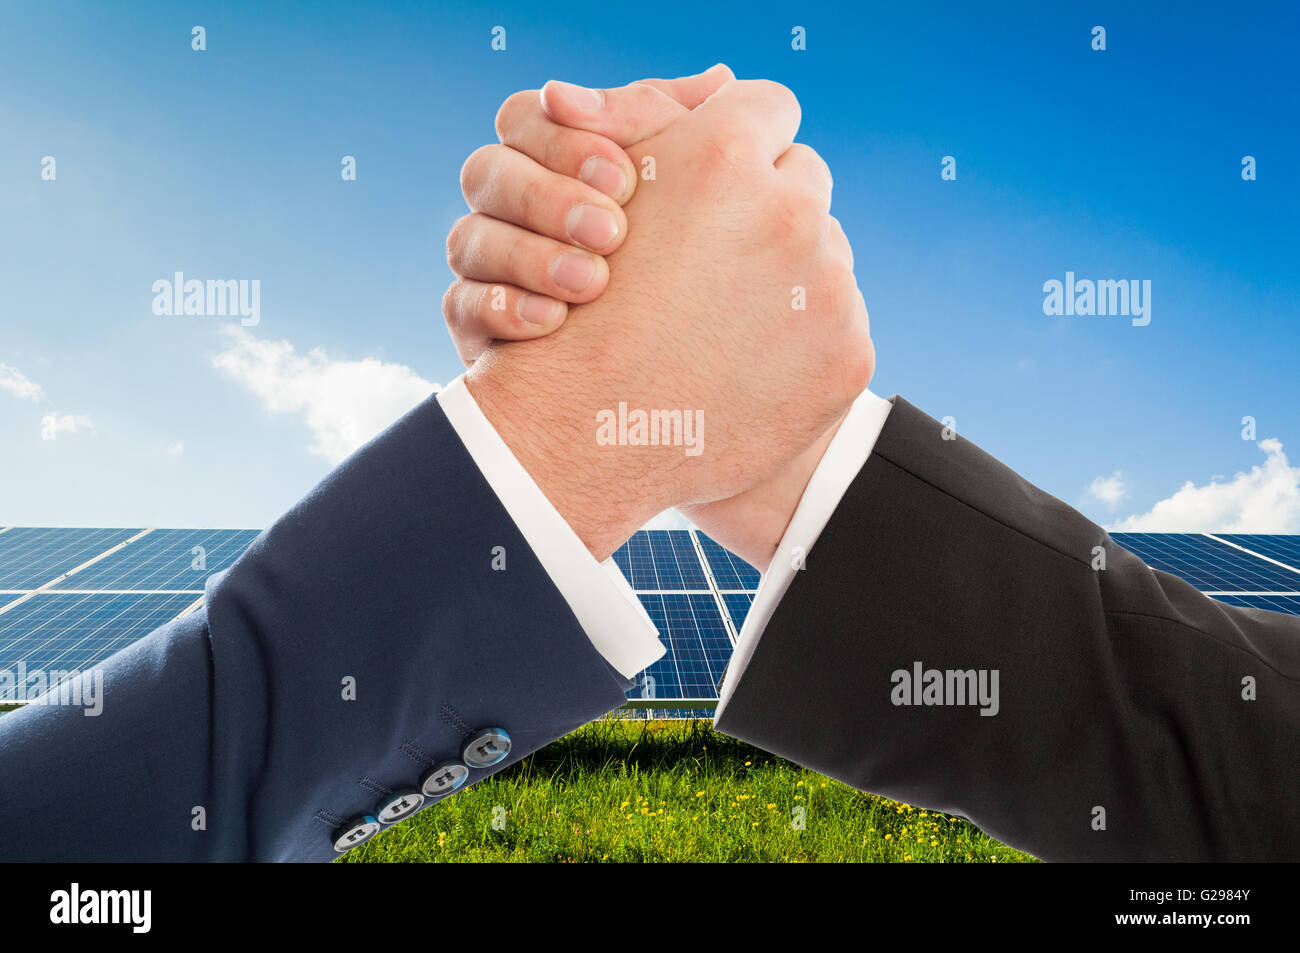 Businessmen handshake as teamwork on solarpower photovoltaic panel background. Renewable energy partnership agreement - Stock Image